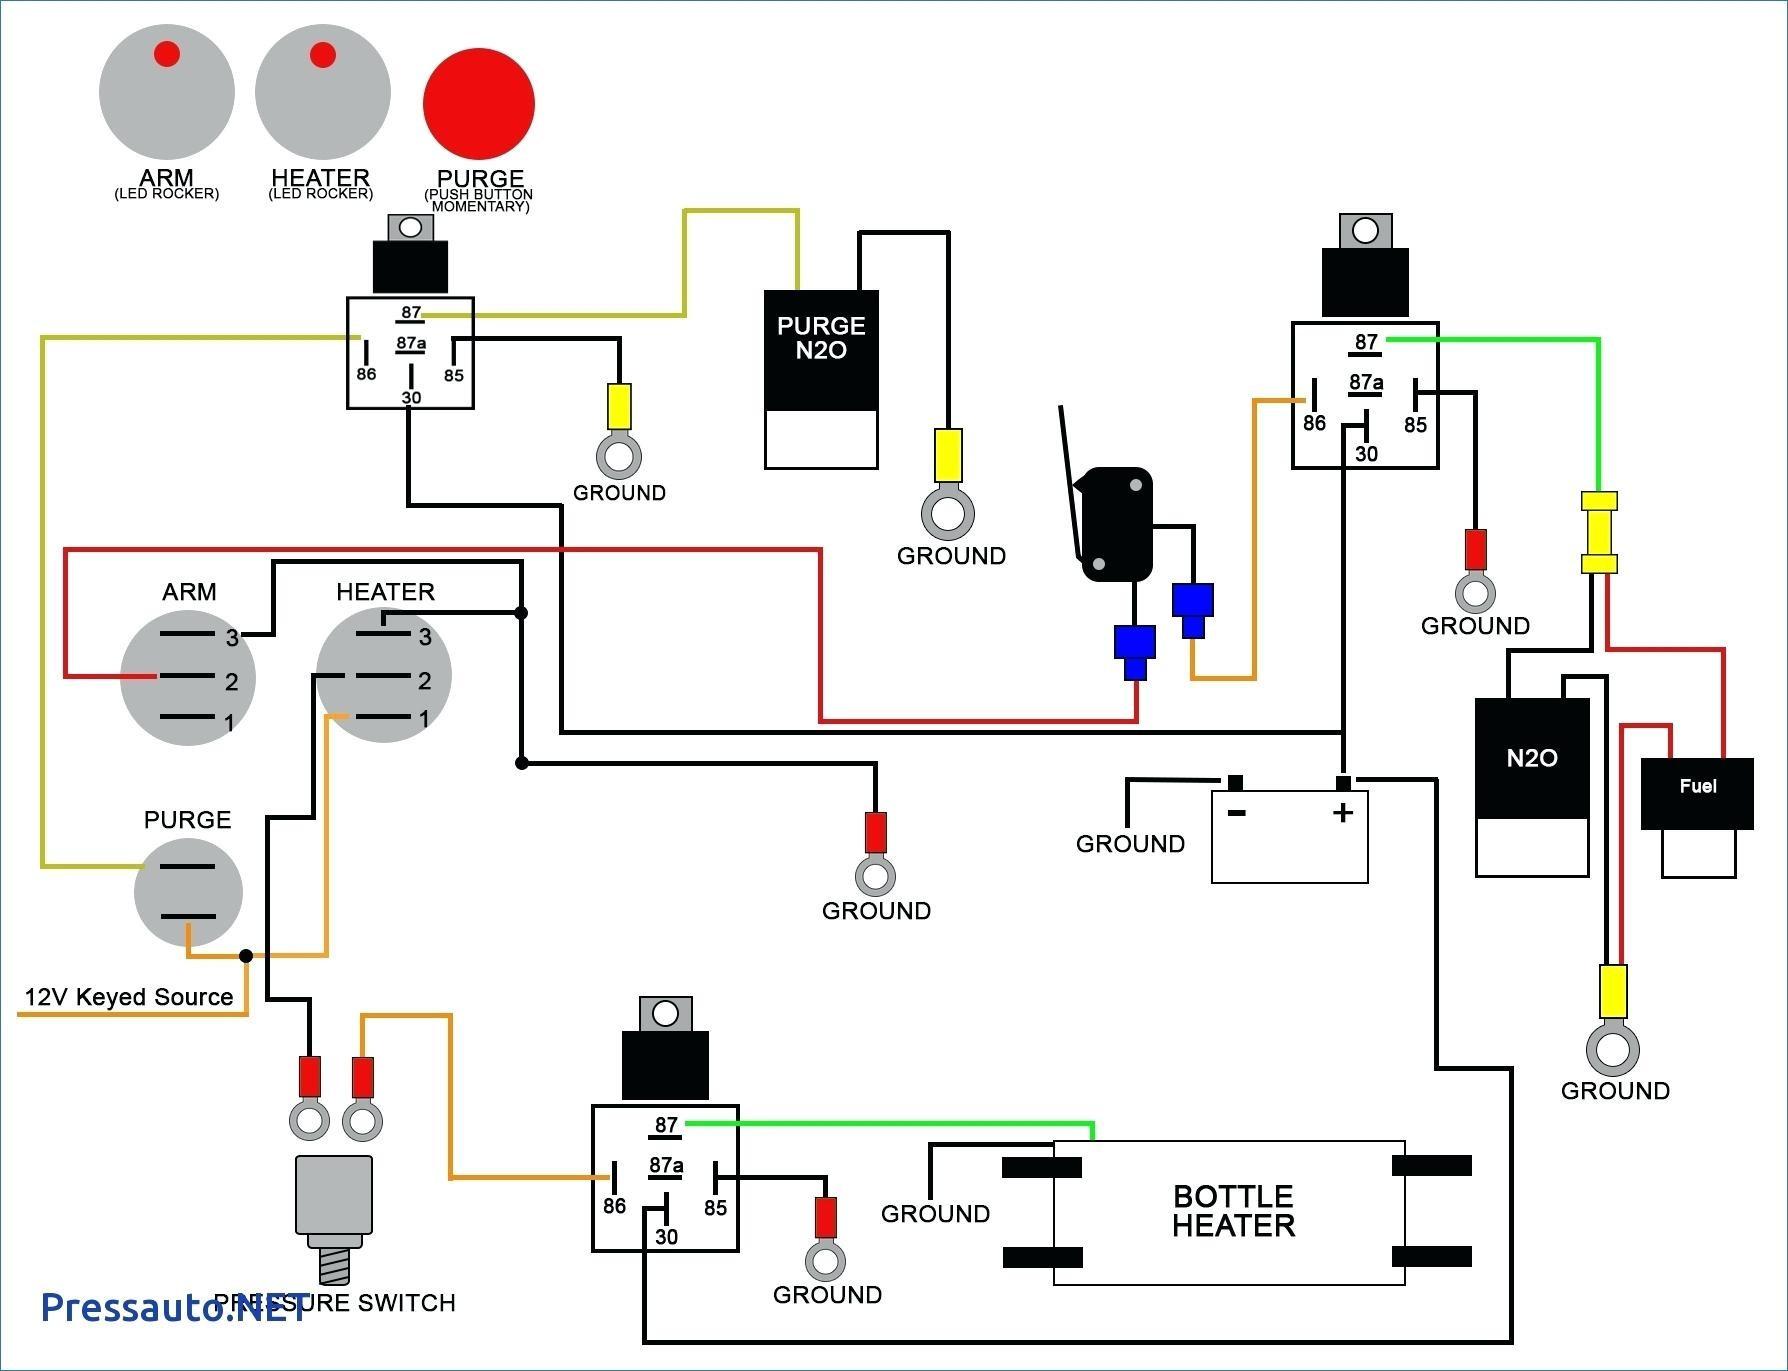 Sure Power Battery Isolator Wiring Diagram Luxury Sure Power Battery - Sure Power Battery Isolator Wiring Diagram